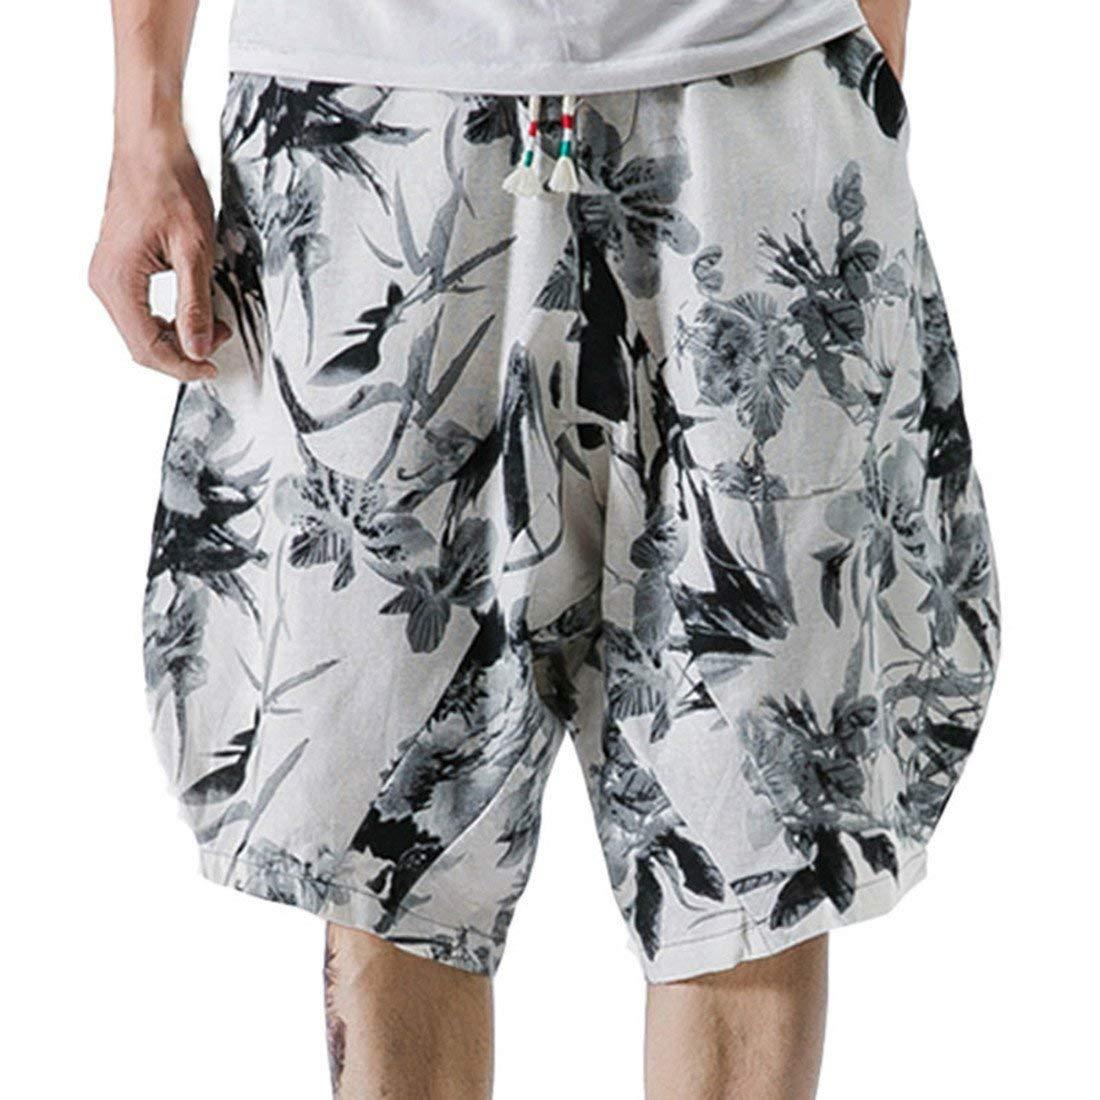 Hzcx Fashion Men's Printed Drop Crotch Cotton Linen Elastic Waist Casual Shorts